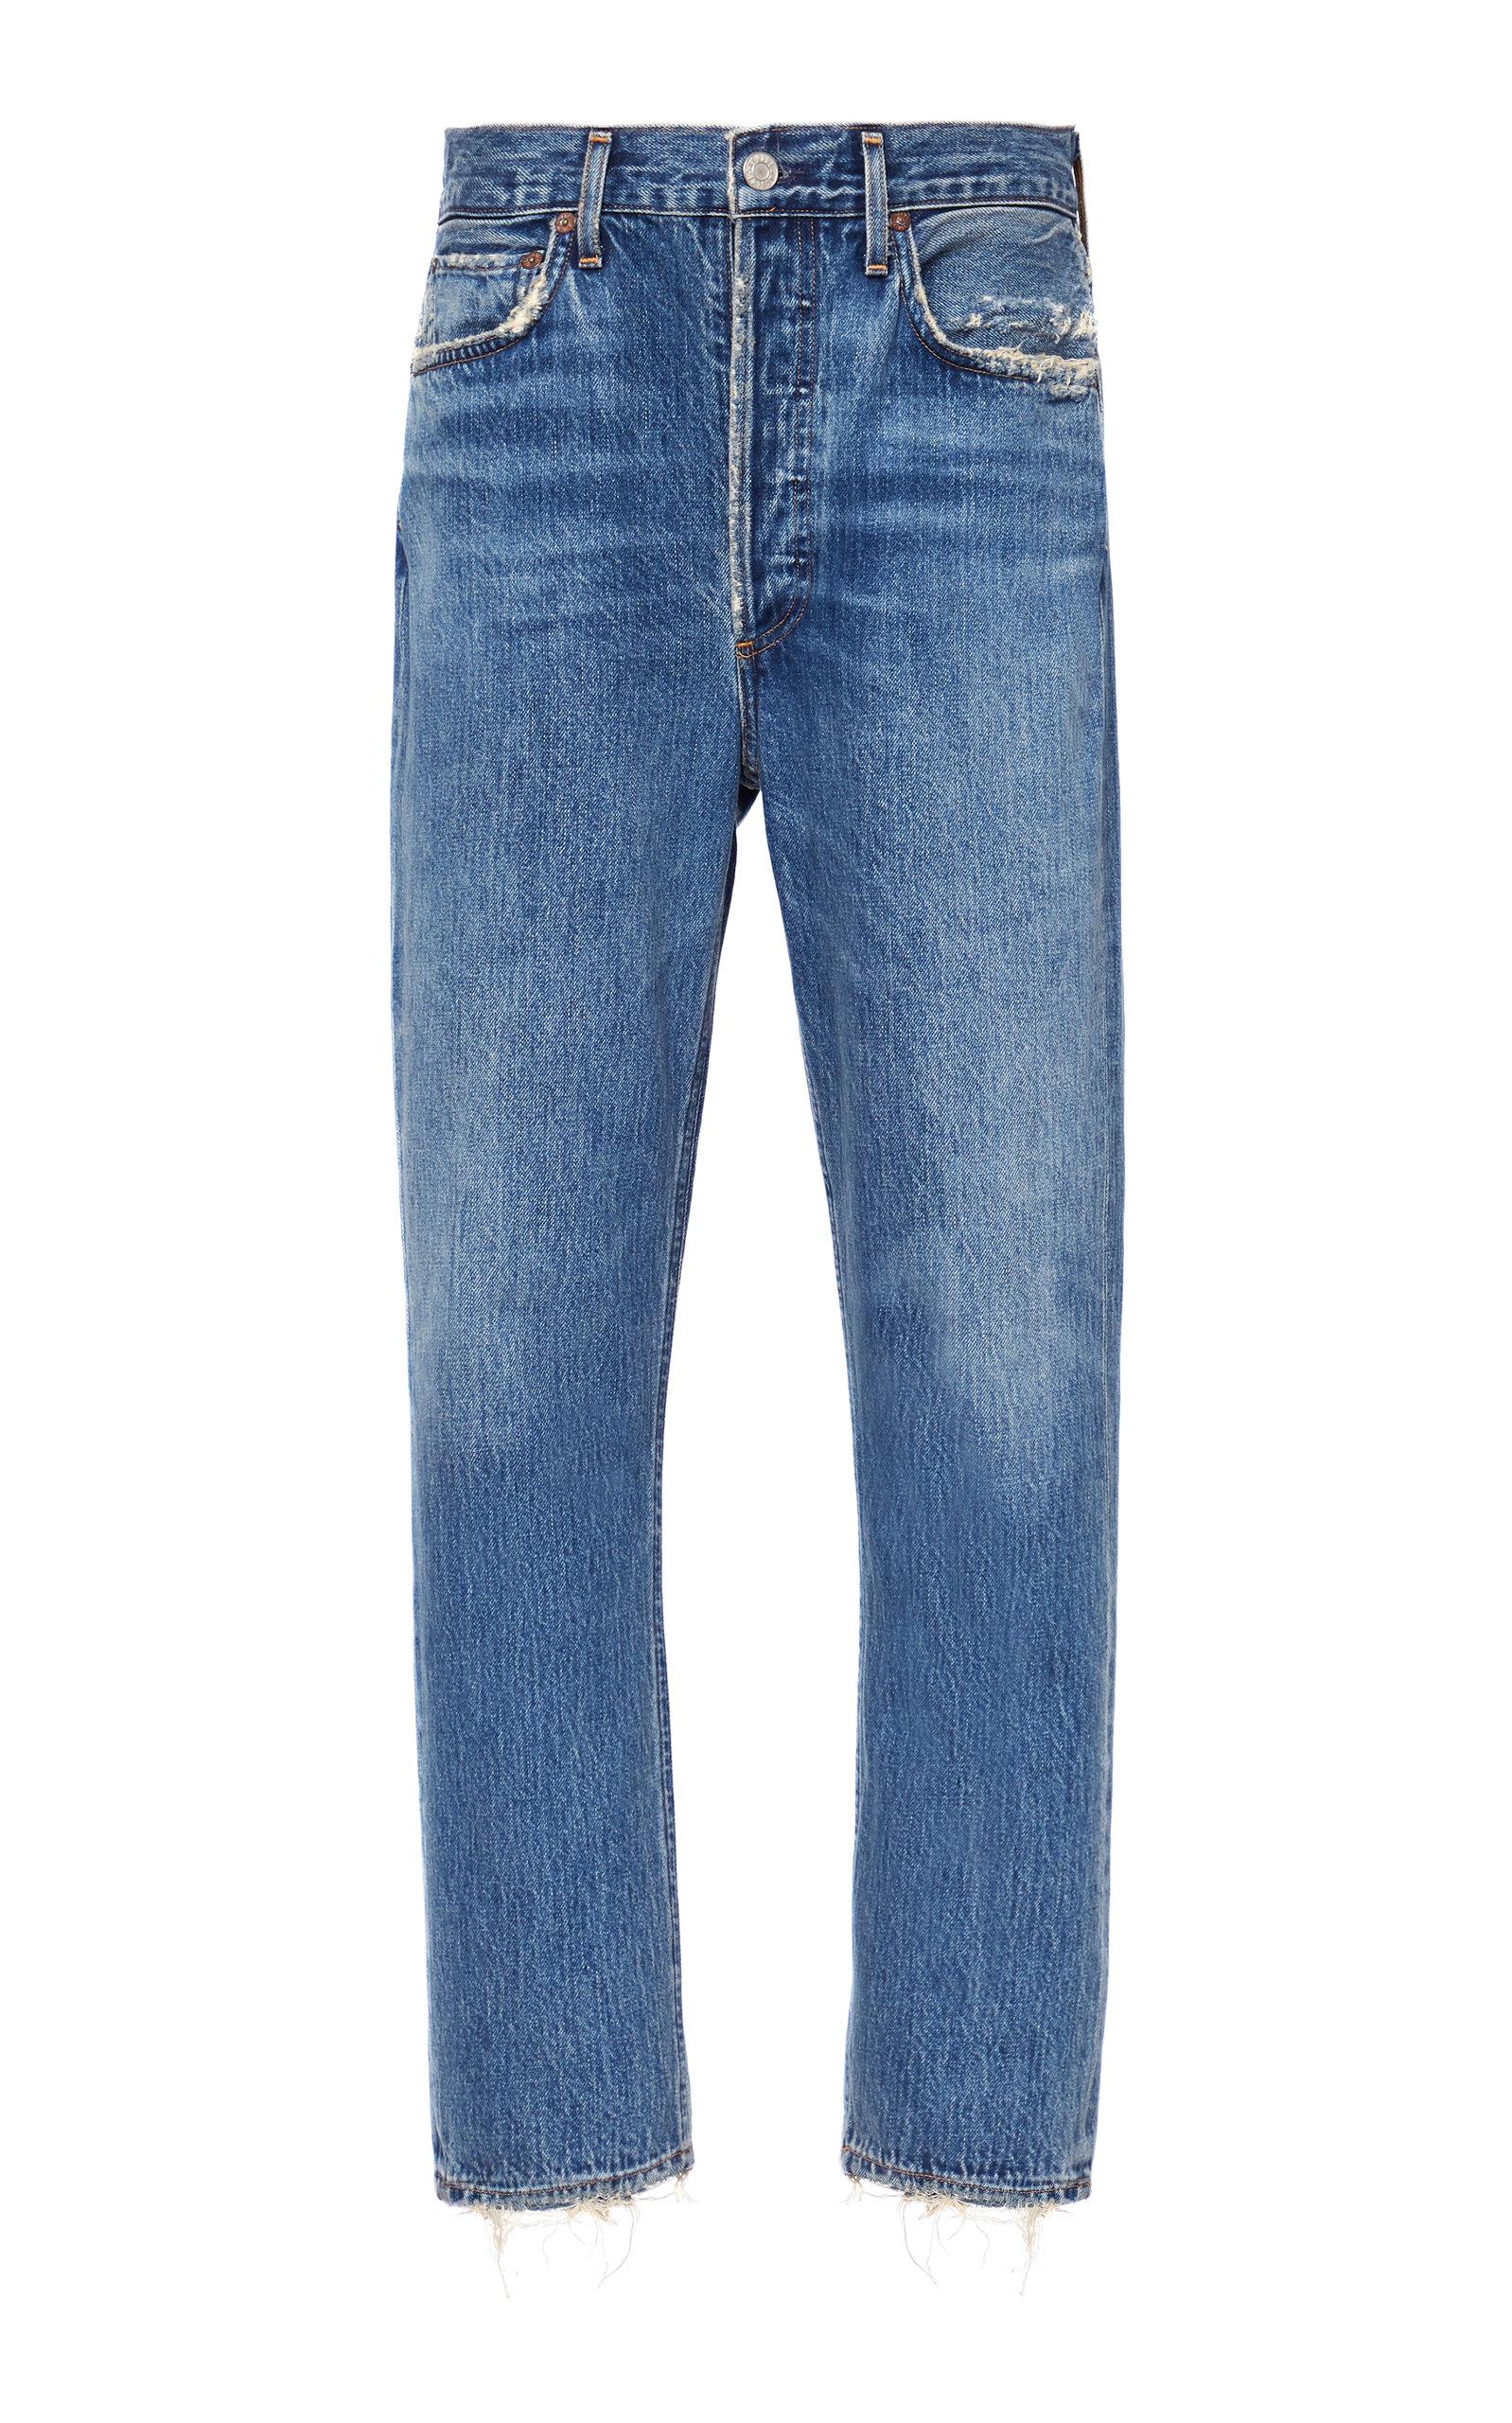 Agolde - Women's Riley Cropped High-Rise Straight-Leg Jeans - Medium Wash - Moda Operandi